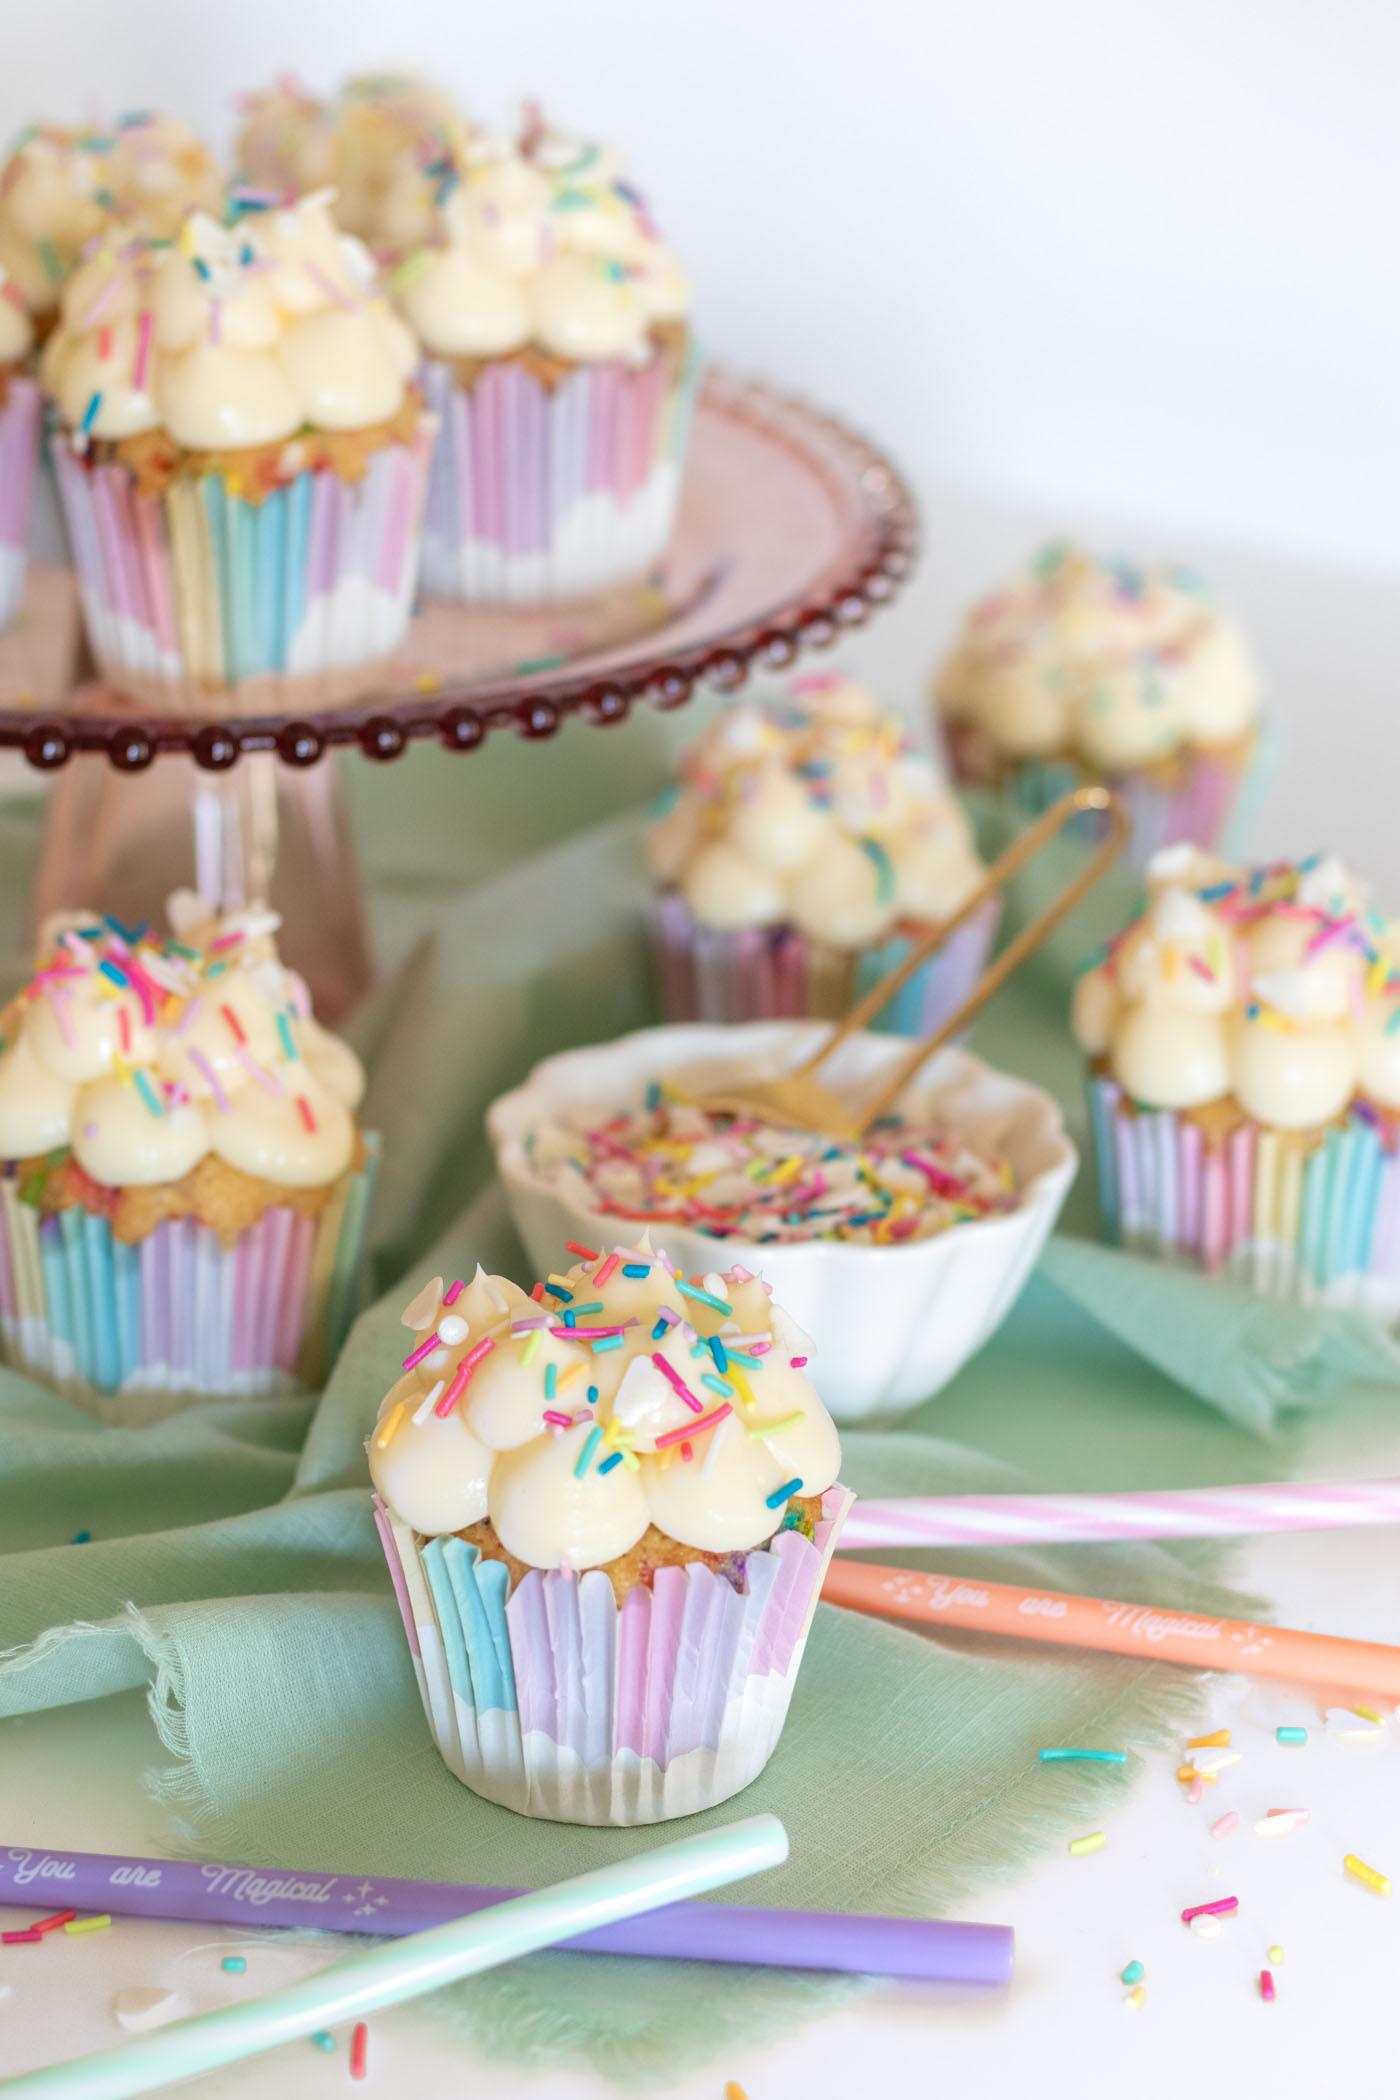 Magical Funfetti Cloud Cupcakes | Club Crafted